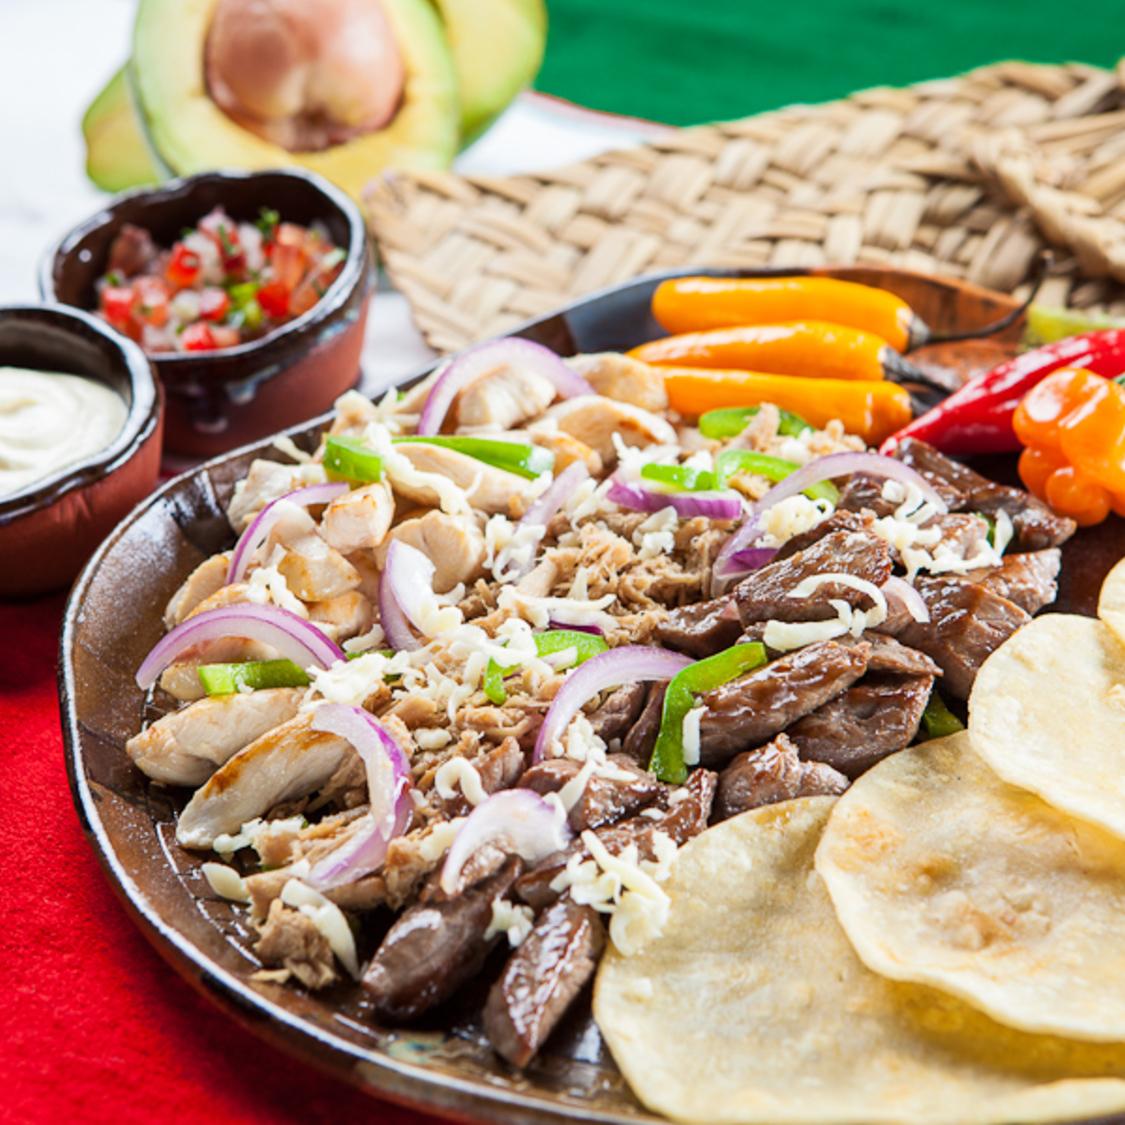 Guacamole Cocina Mexicana - Porto Alegre Guacamole Cocina Mexicana - Porto  Alegre ... 3d0fd38adf